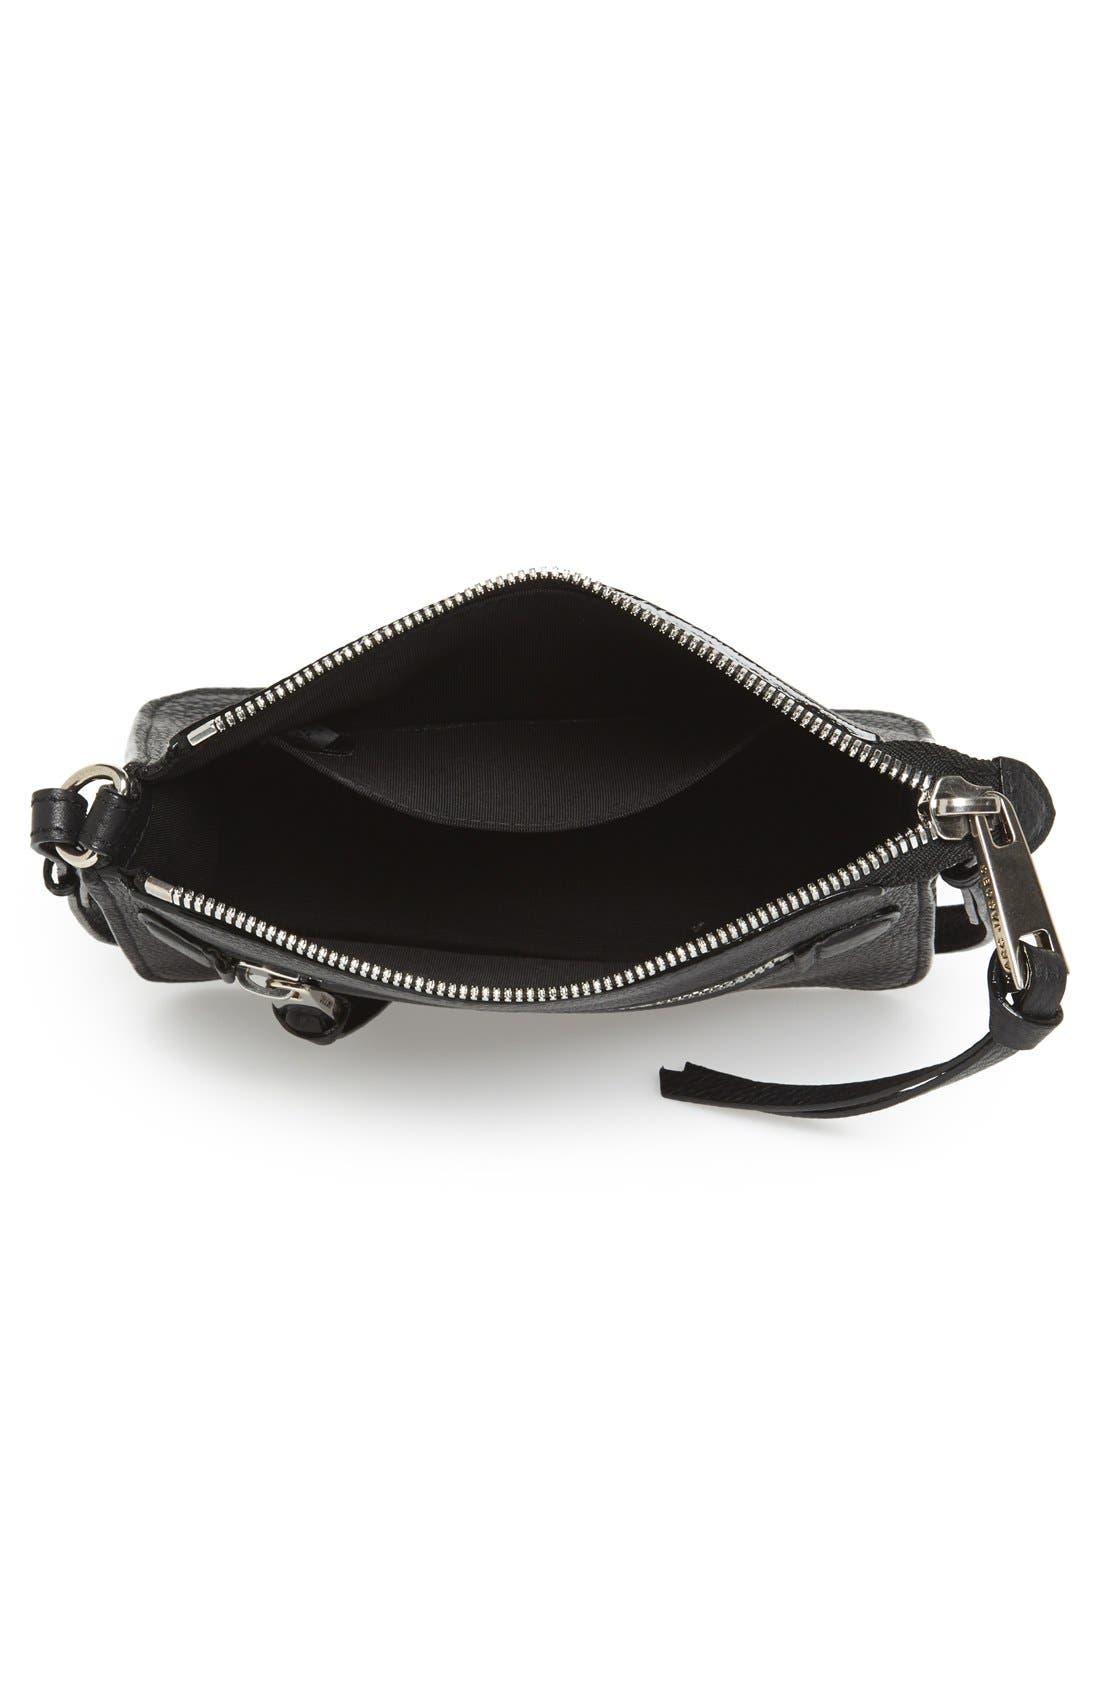 Alternate Image 3  - MARC JACOBS 'Big Apple' Pouchette Crossbody Bag